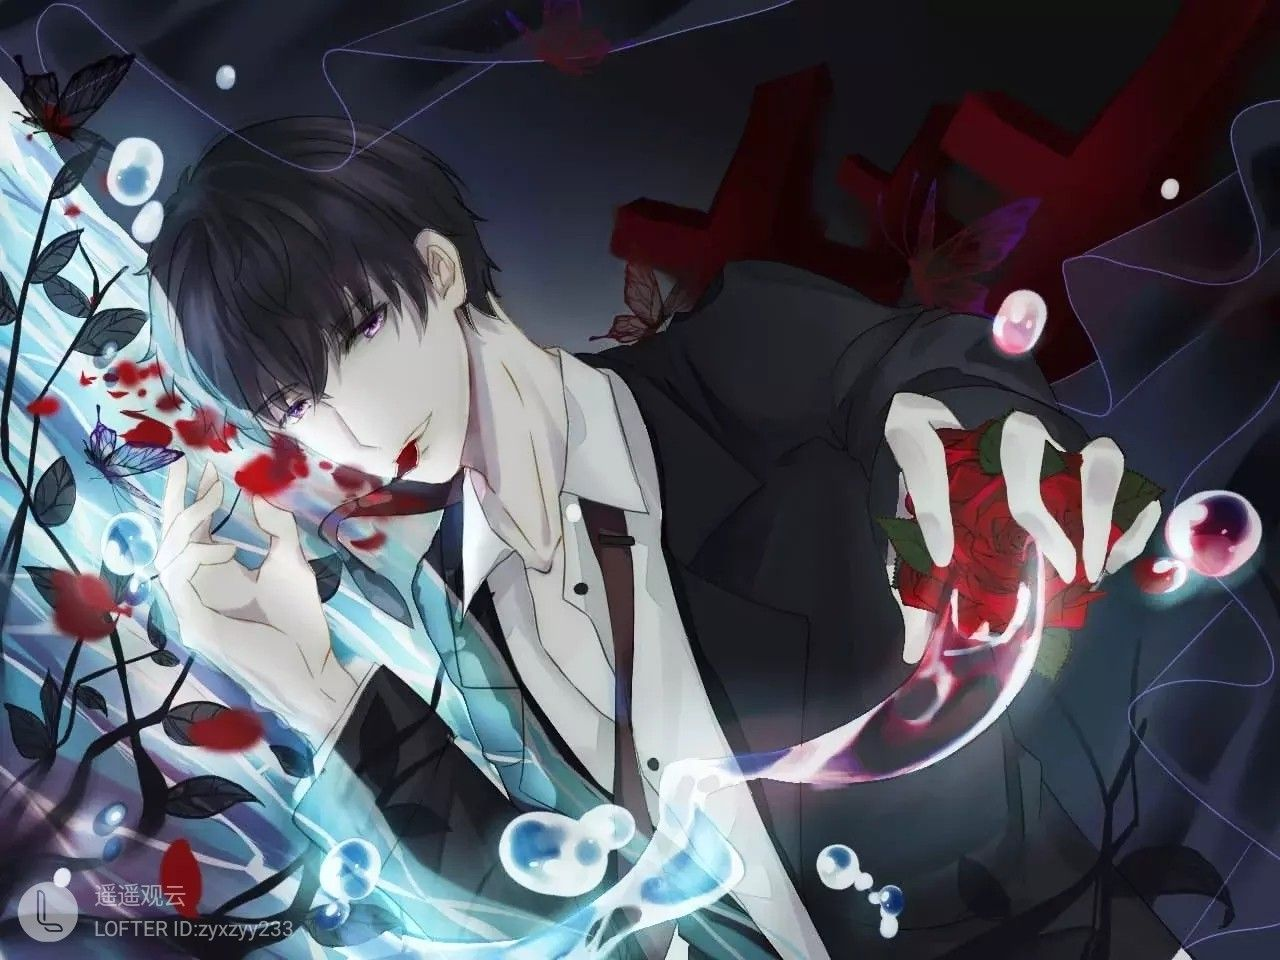 Pin by Neko Kawaii on boy in 2020 Anime, Boy art